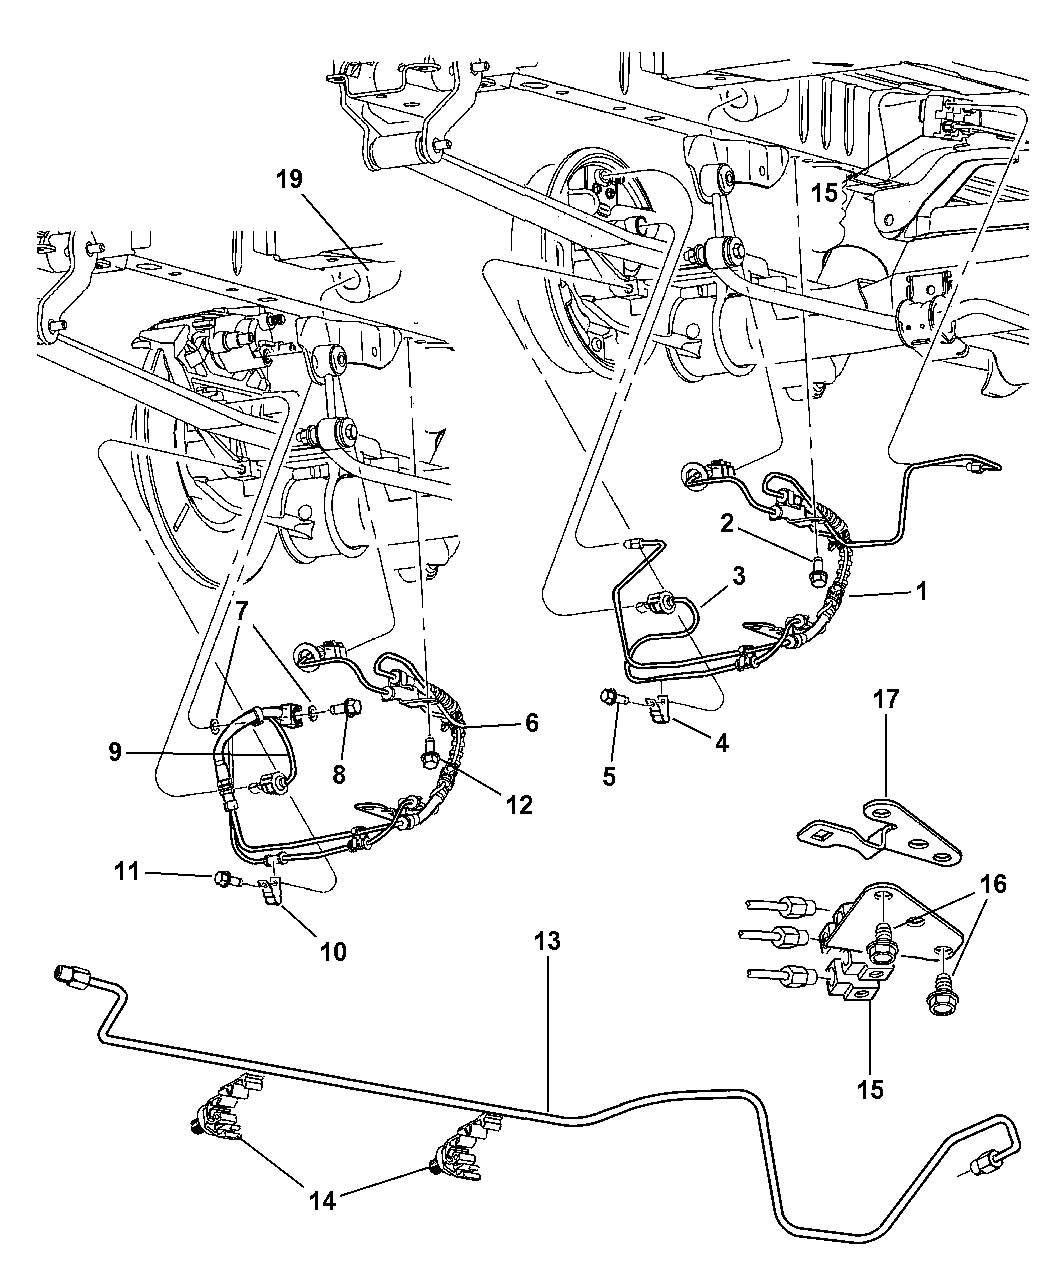 2005 Dodge Caravan Parts Diagram Hoses • Wiring Diagram